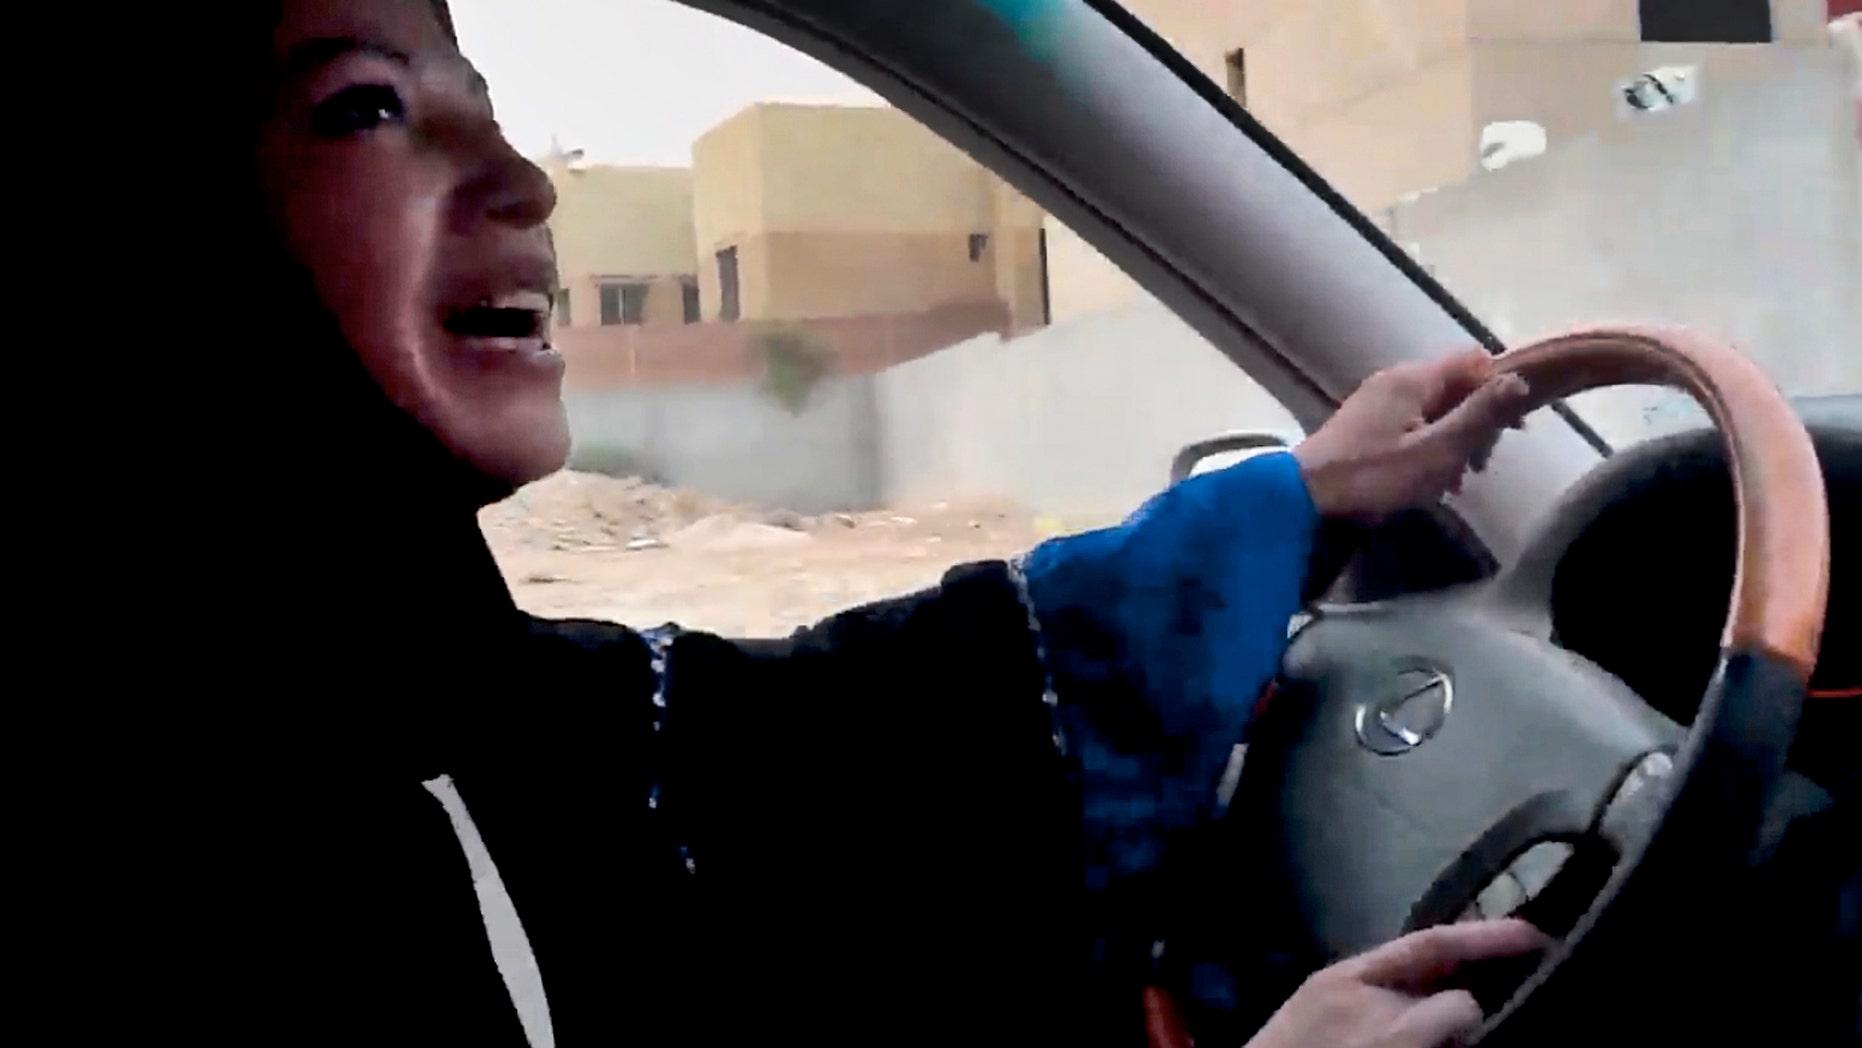 June 17, 2011: A Saudi Arabian woman drives a car as part of a campaign to defy Saudi Arabia's ban on women driving, in Riyadh, Saudi Arabia.